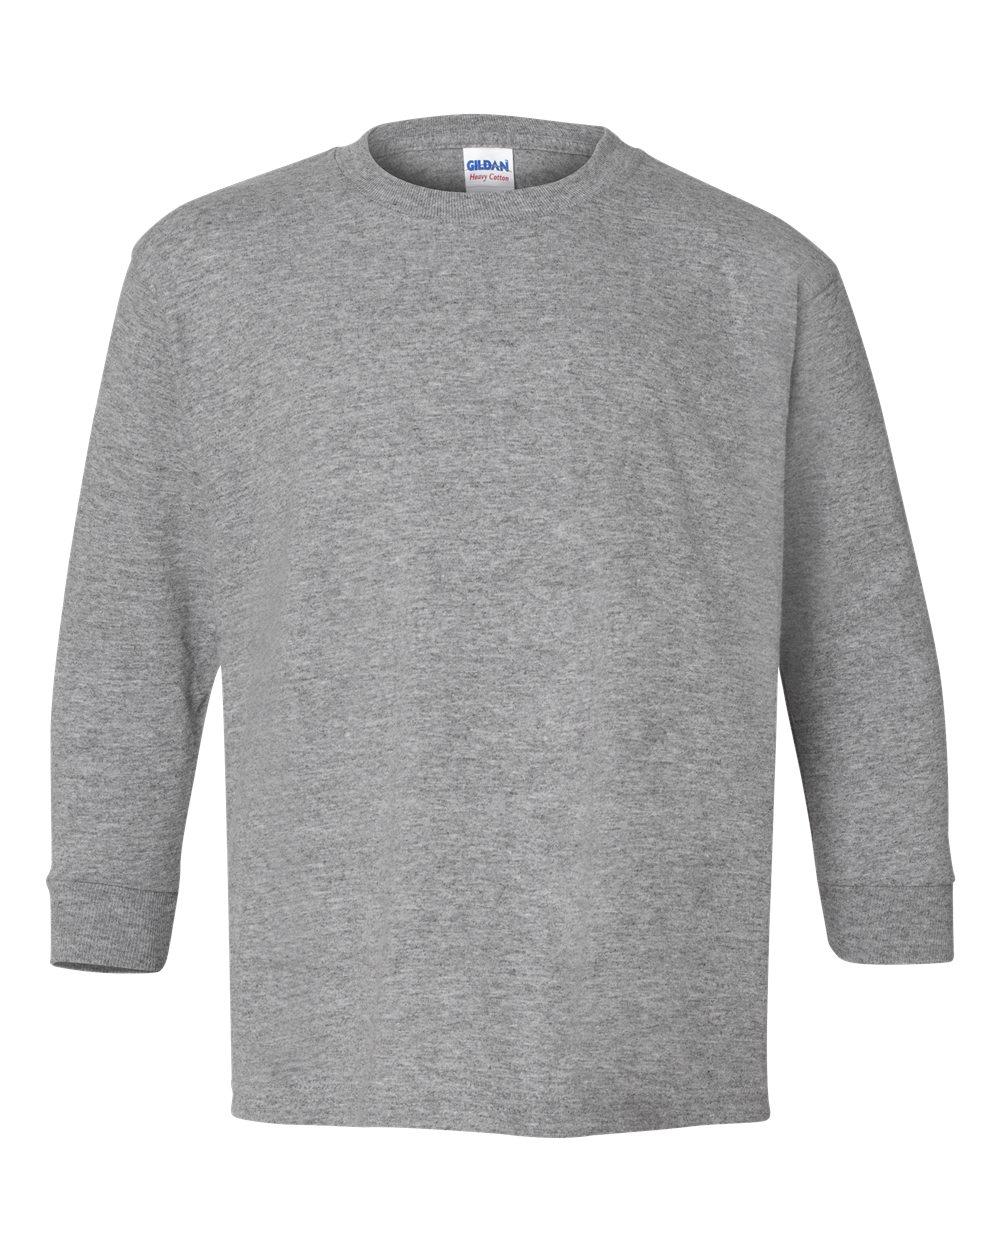 408b4556a54 Gildan 5400B - Youth Heavy Cotton Long Sleeve T-Shirt